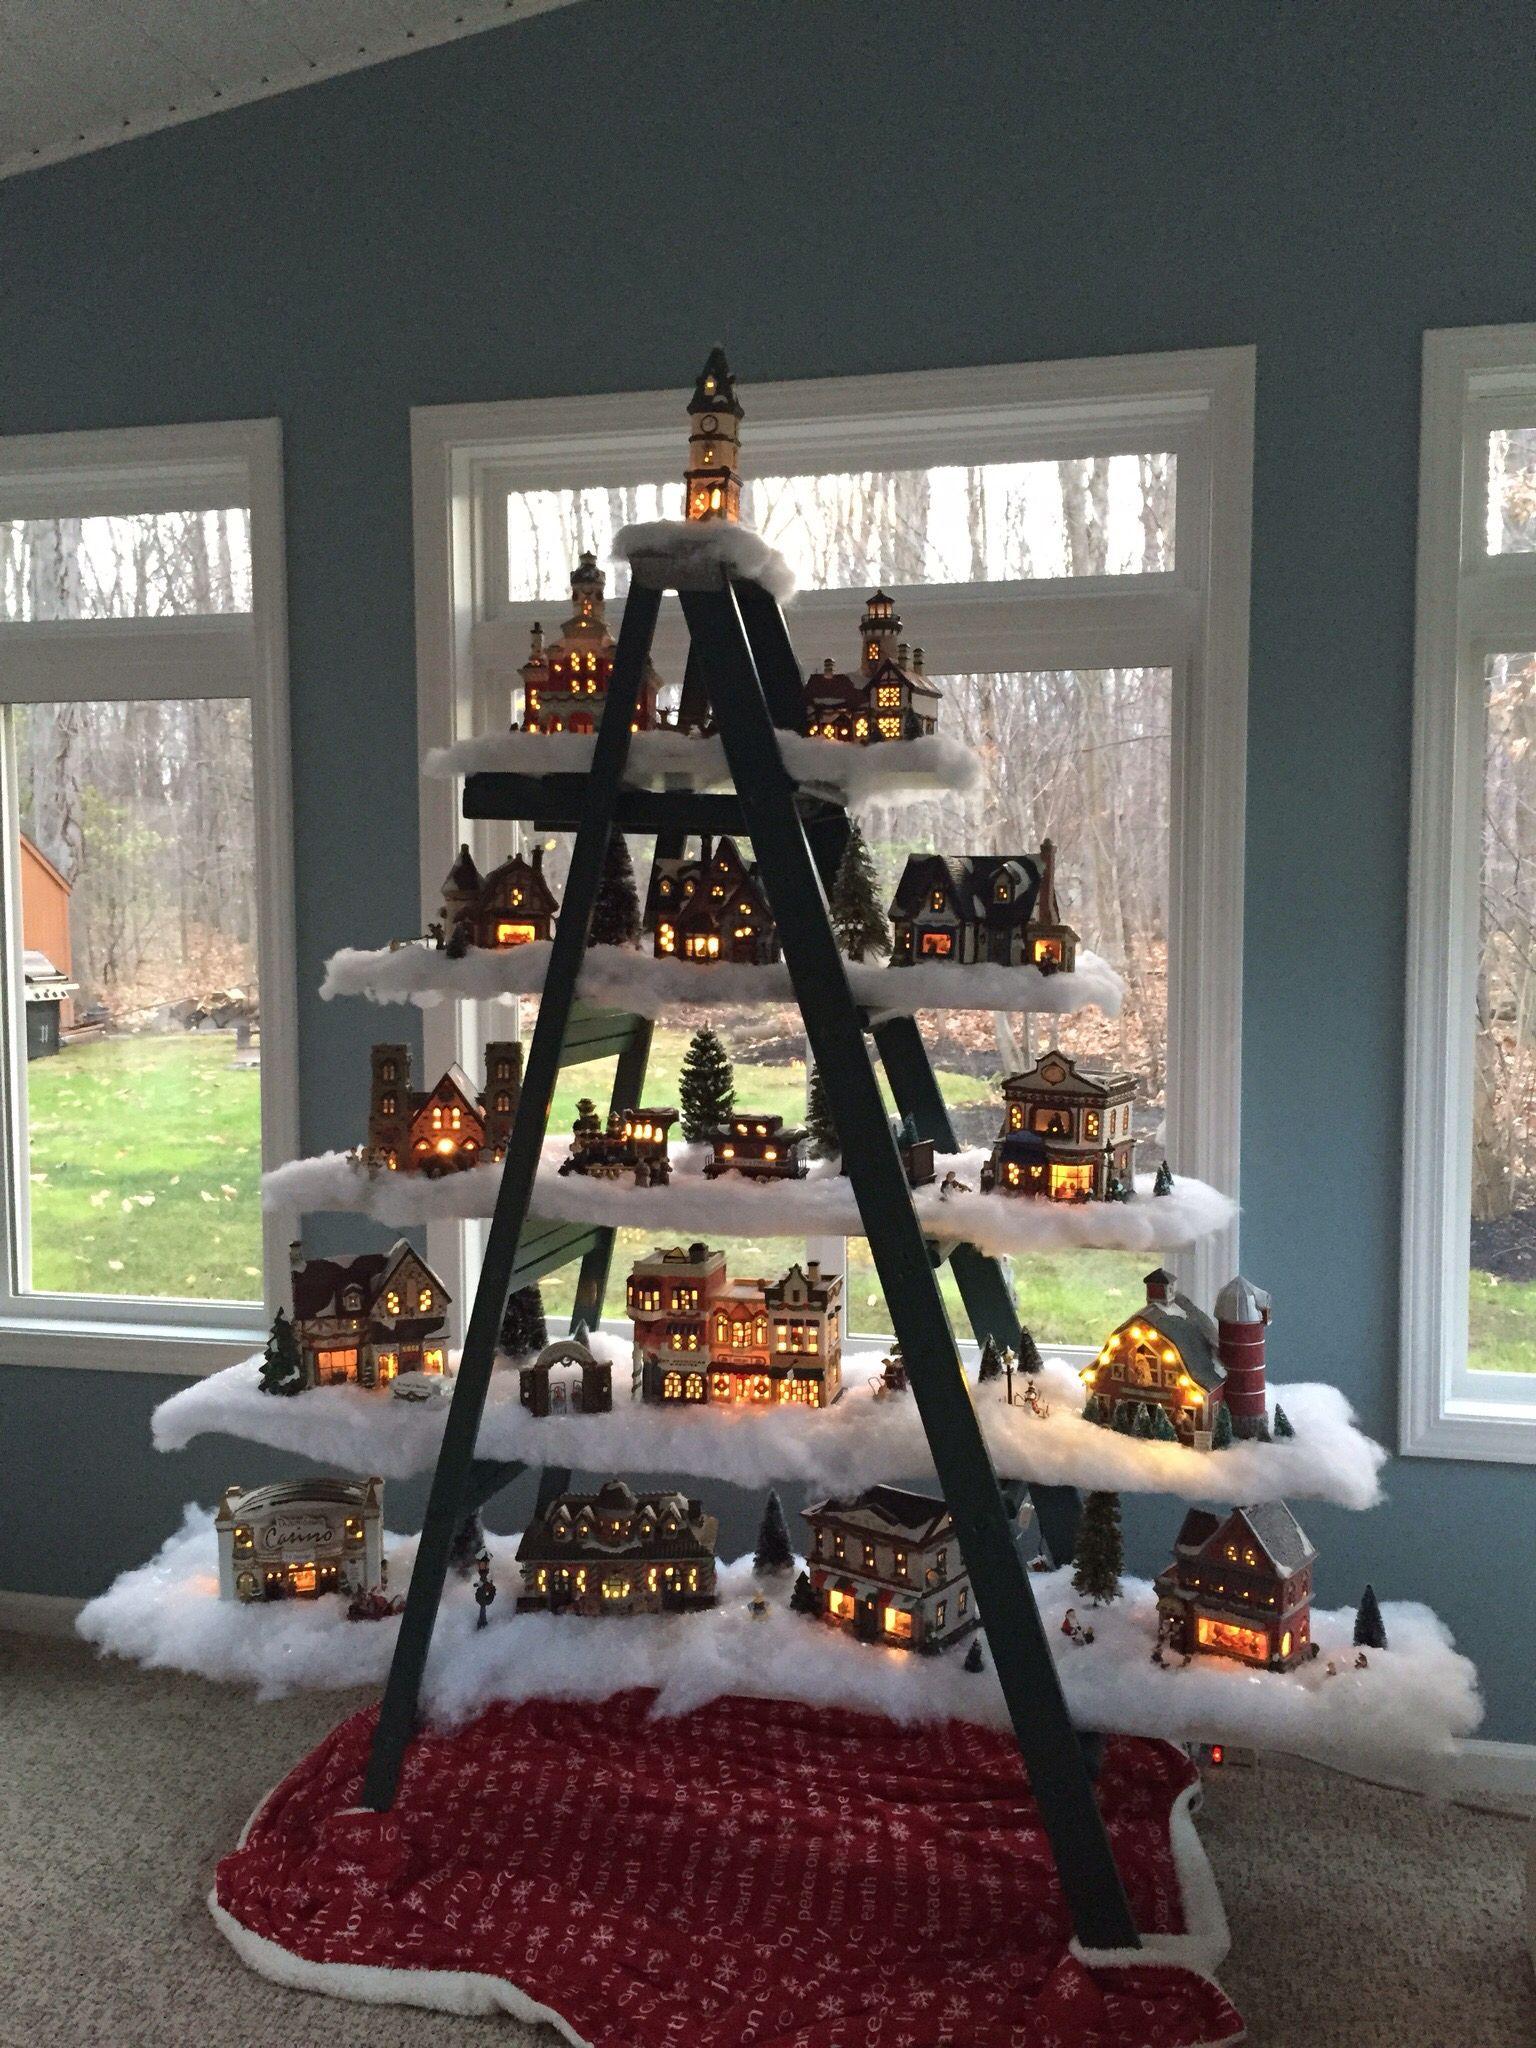 Christmas Tree Ladder | Christmas village display, Christmas deco, Christmas tree design